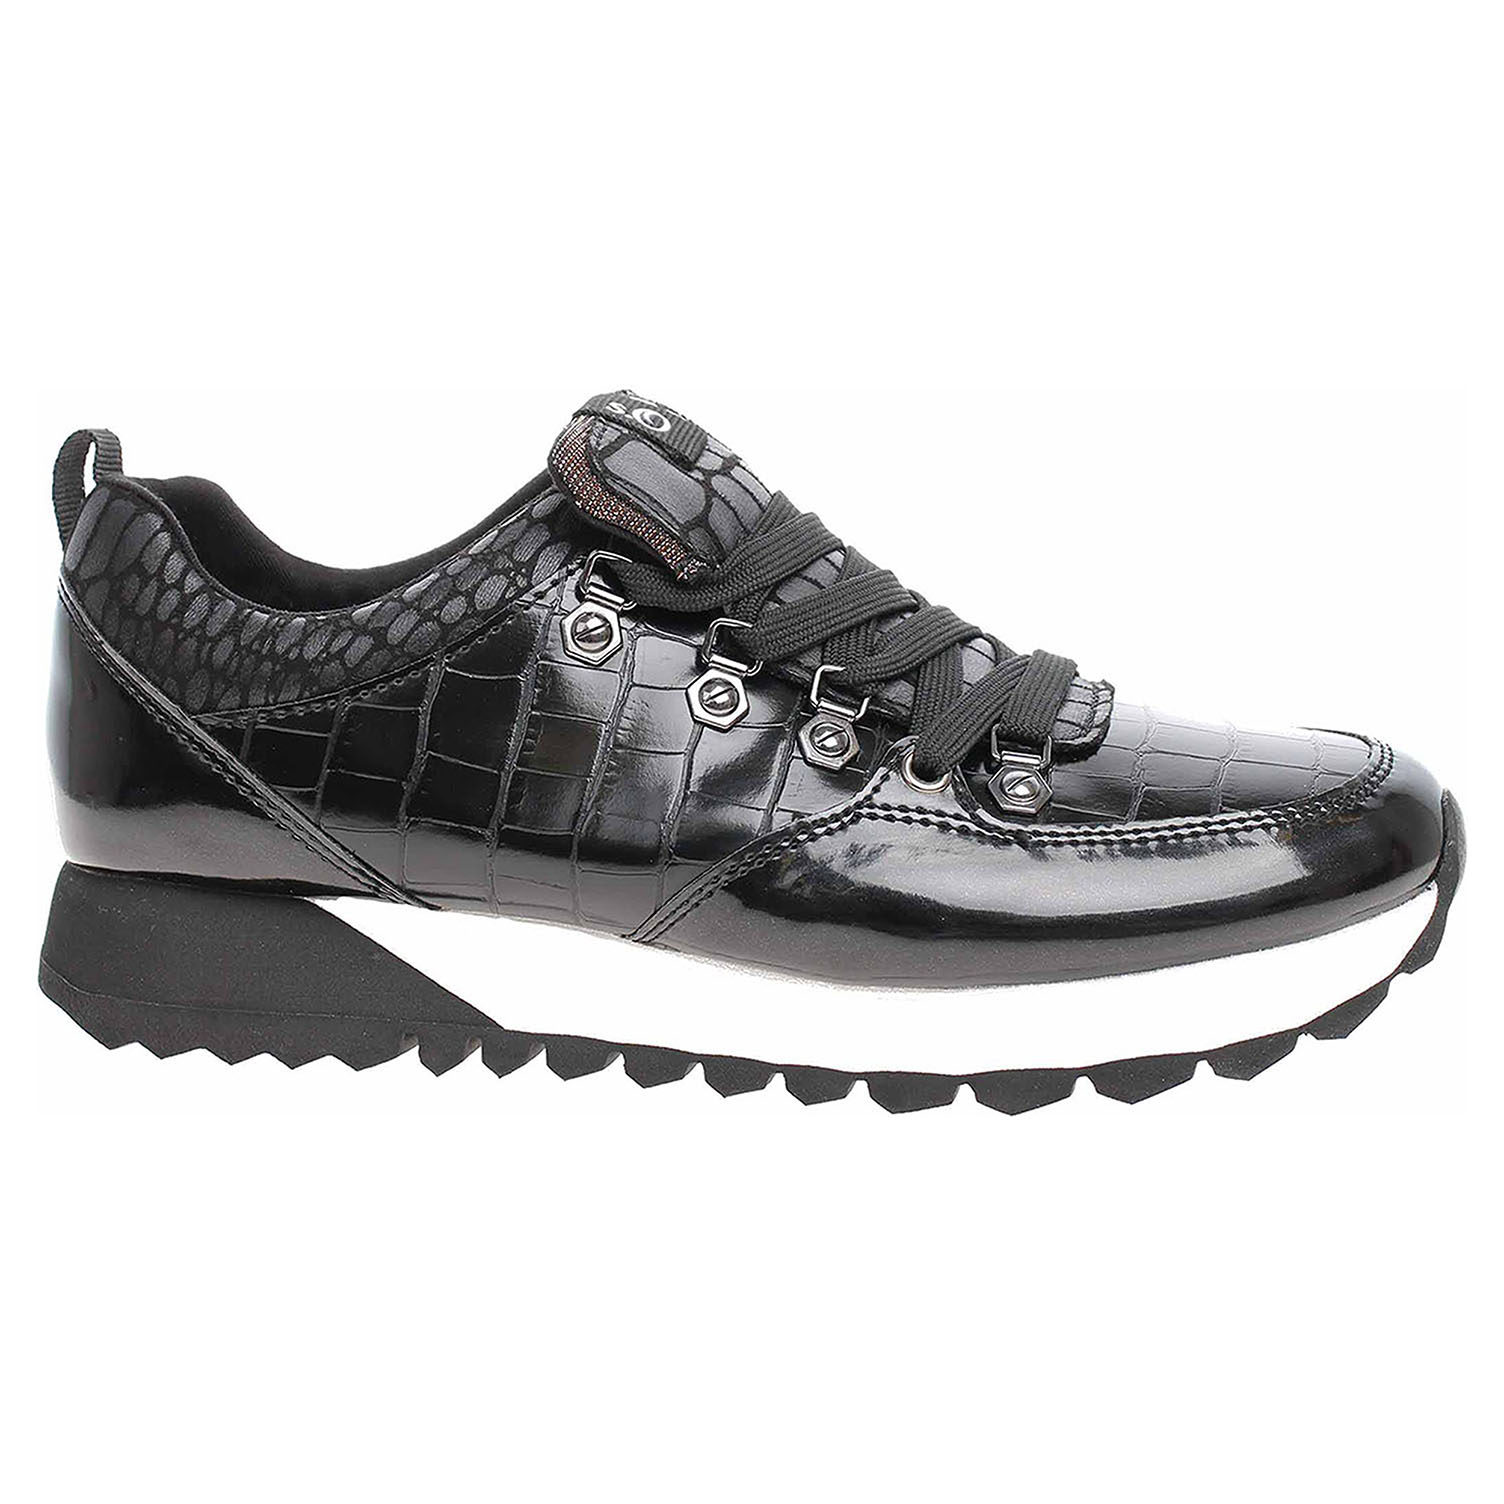 Dámská obuv s.Oliver 5-23622-35 blk croco comb 5-5-23622-35 056 42